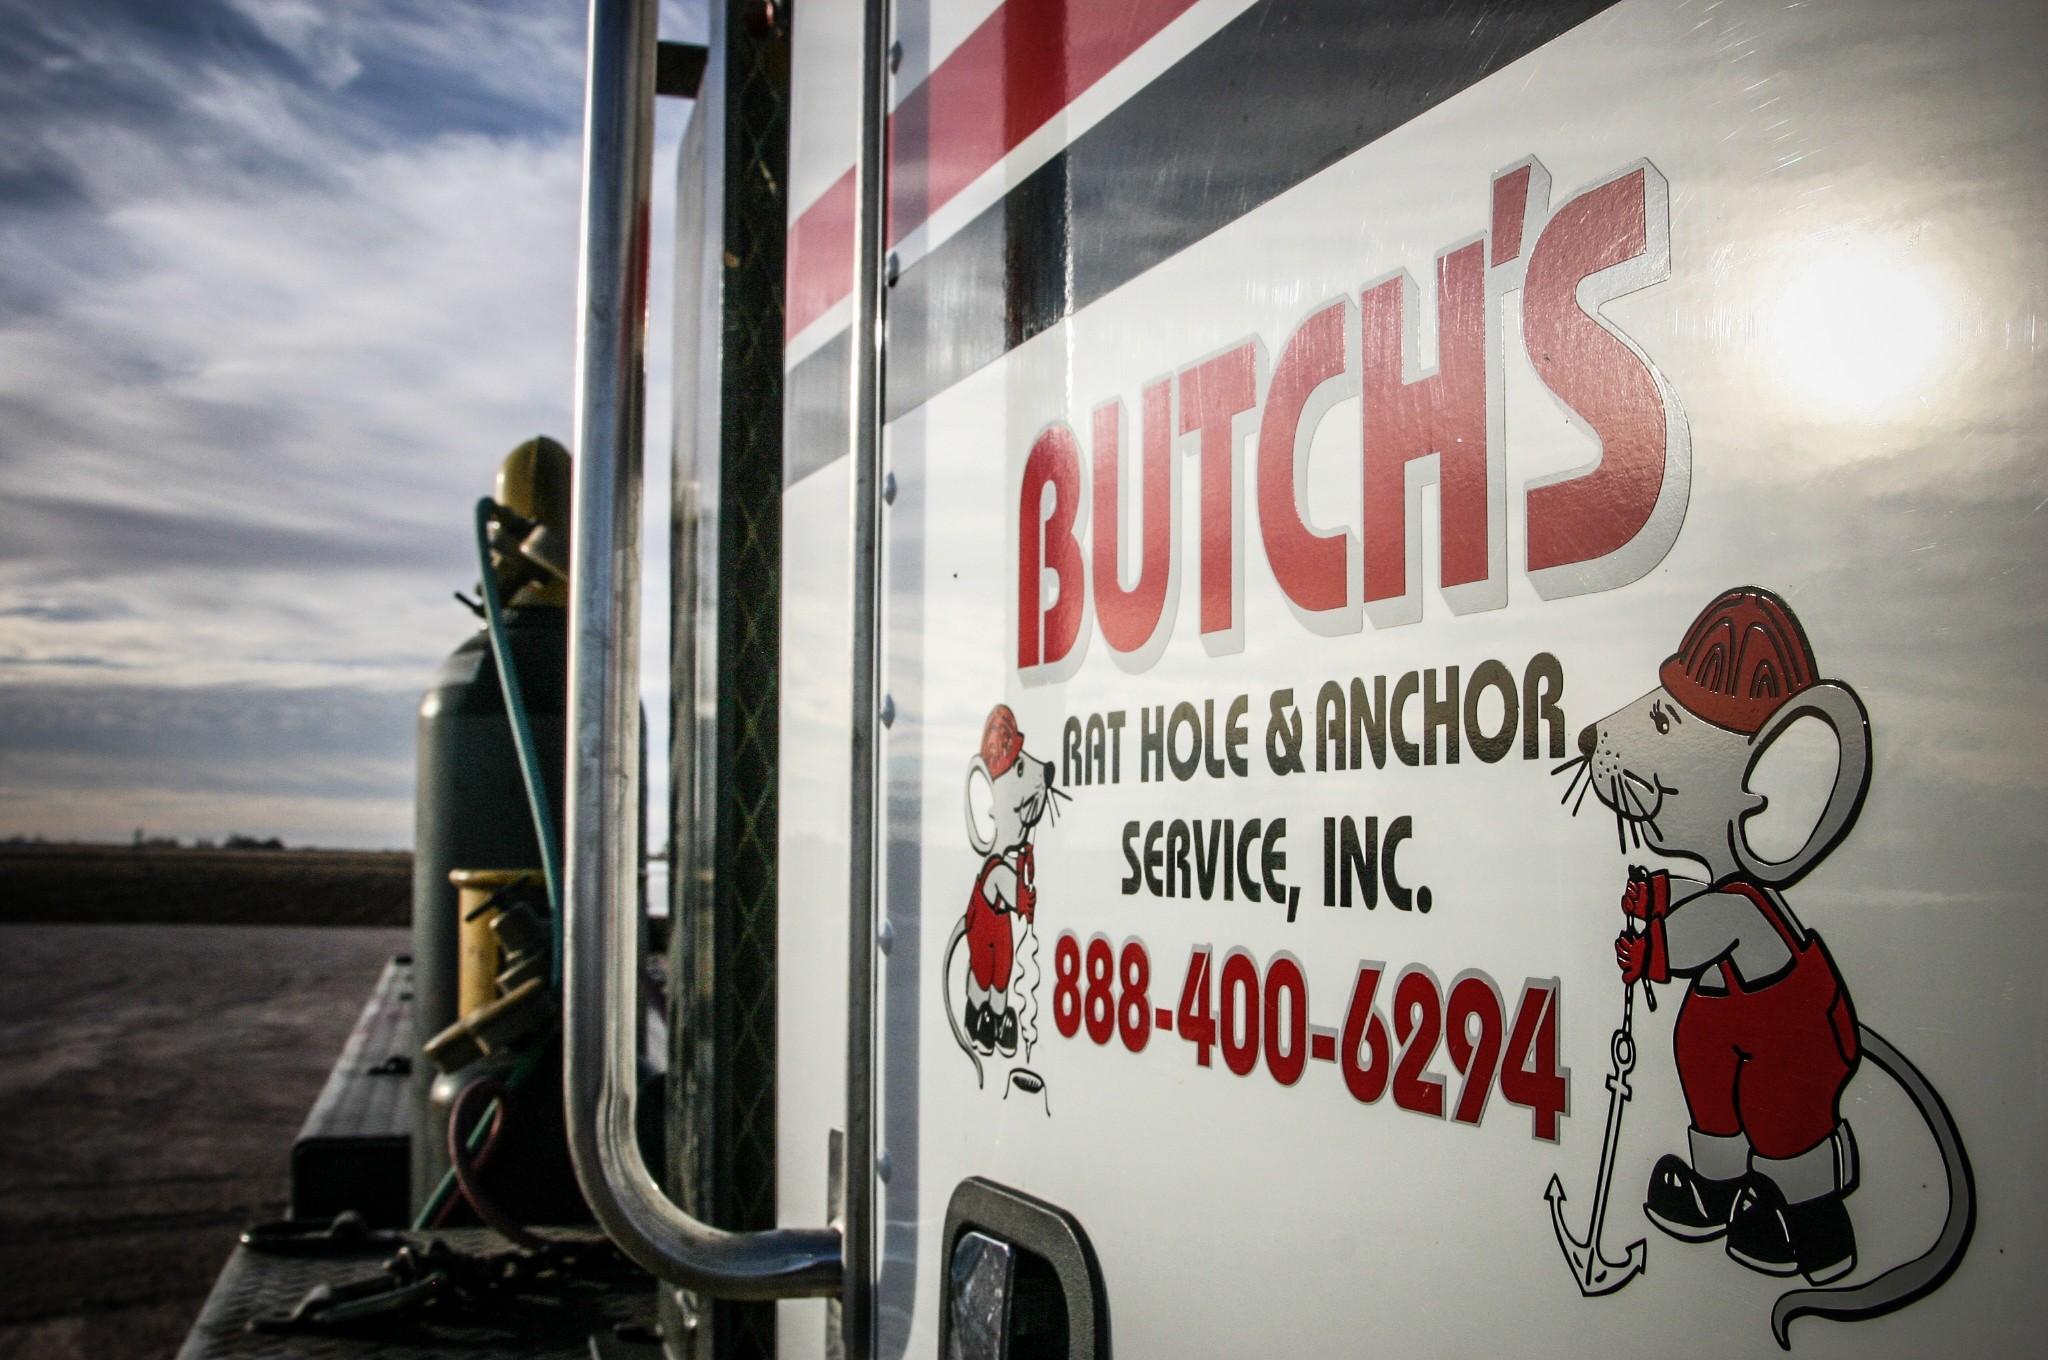 Butch's Companies | LinkedIn